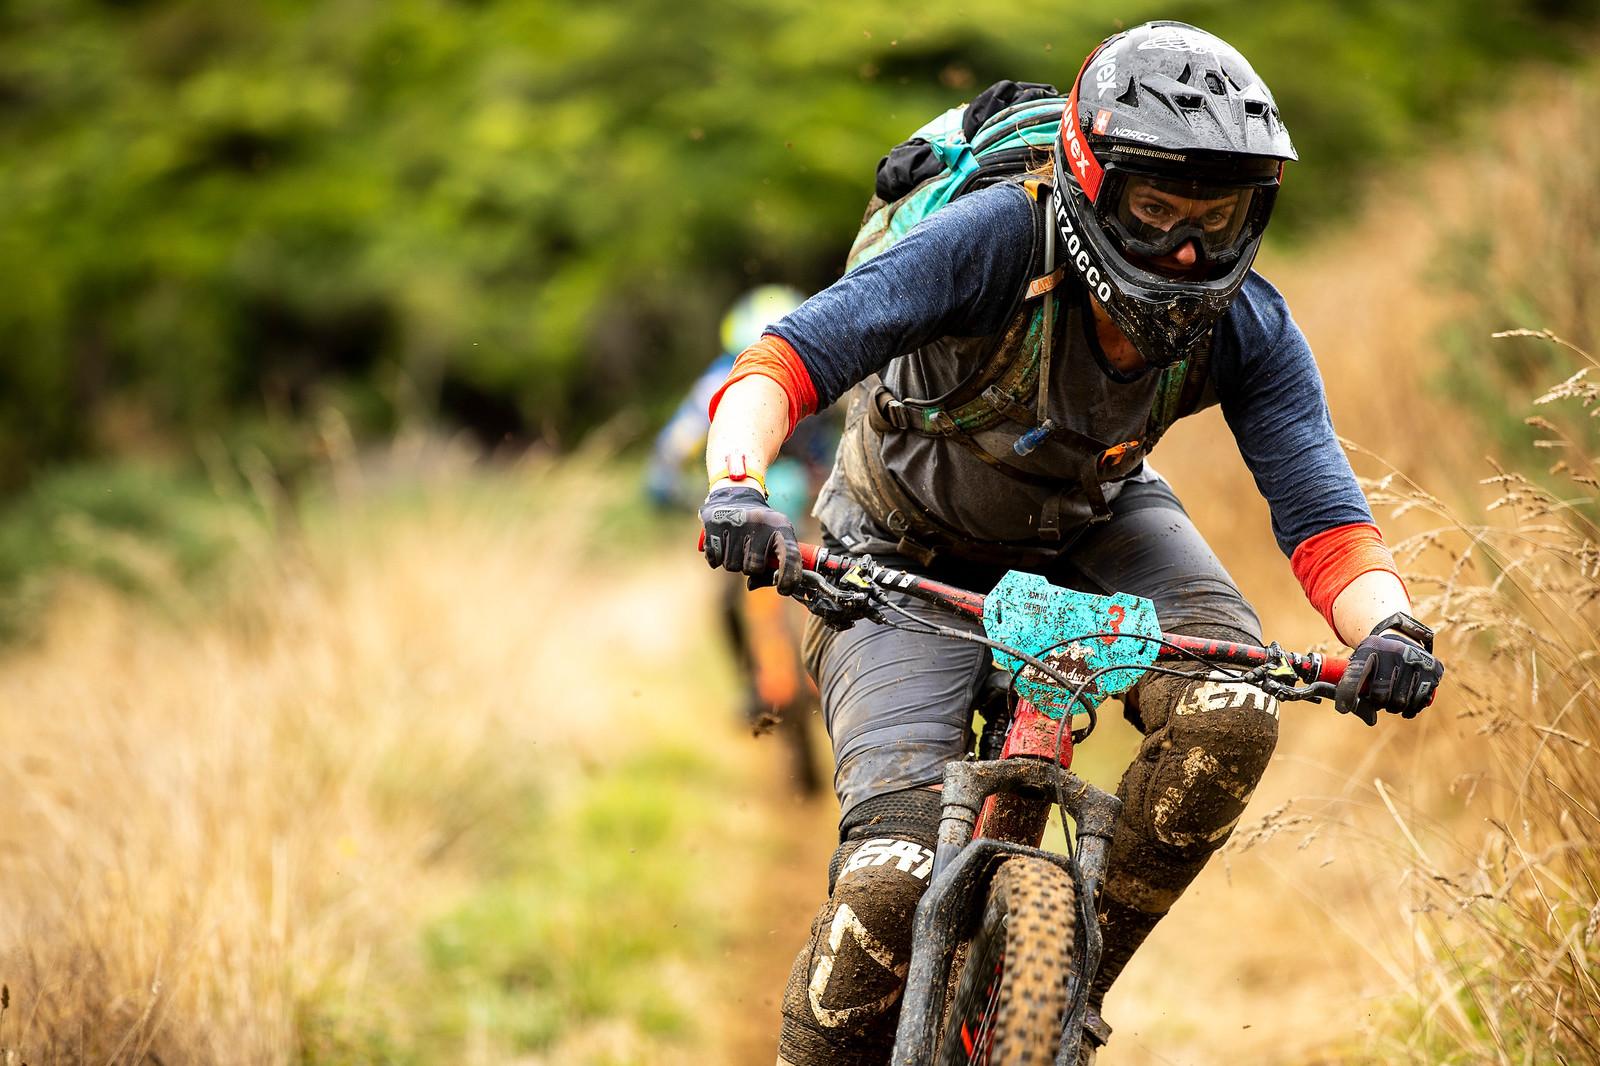 NZEnduro19  m1 8891 - 2019 NZ Enduro Day 2 Photo Gallery - Mountain Biking Pictures - Vital MTB